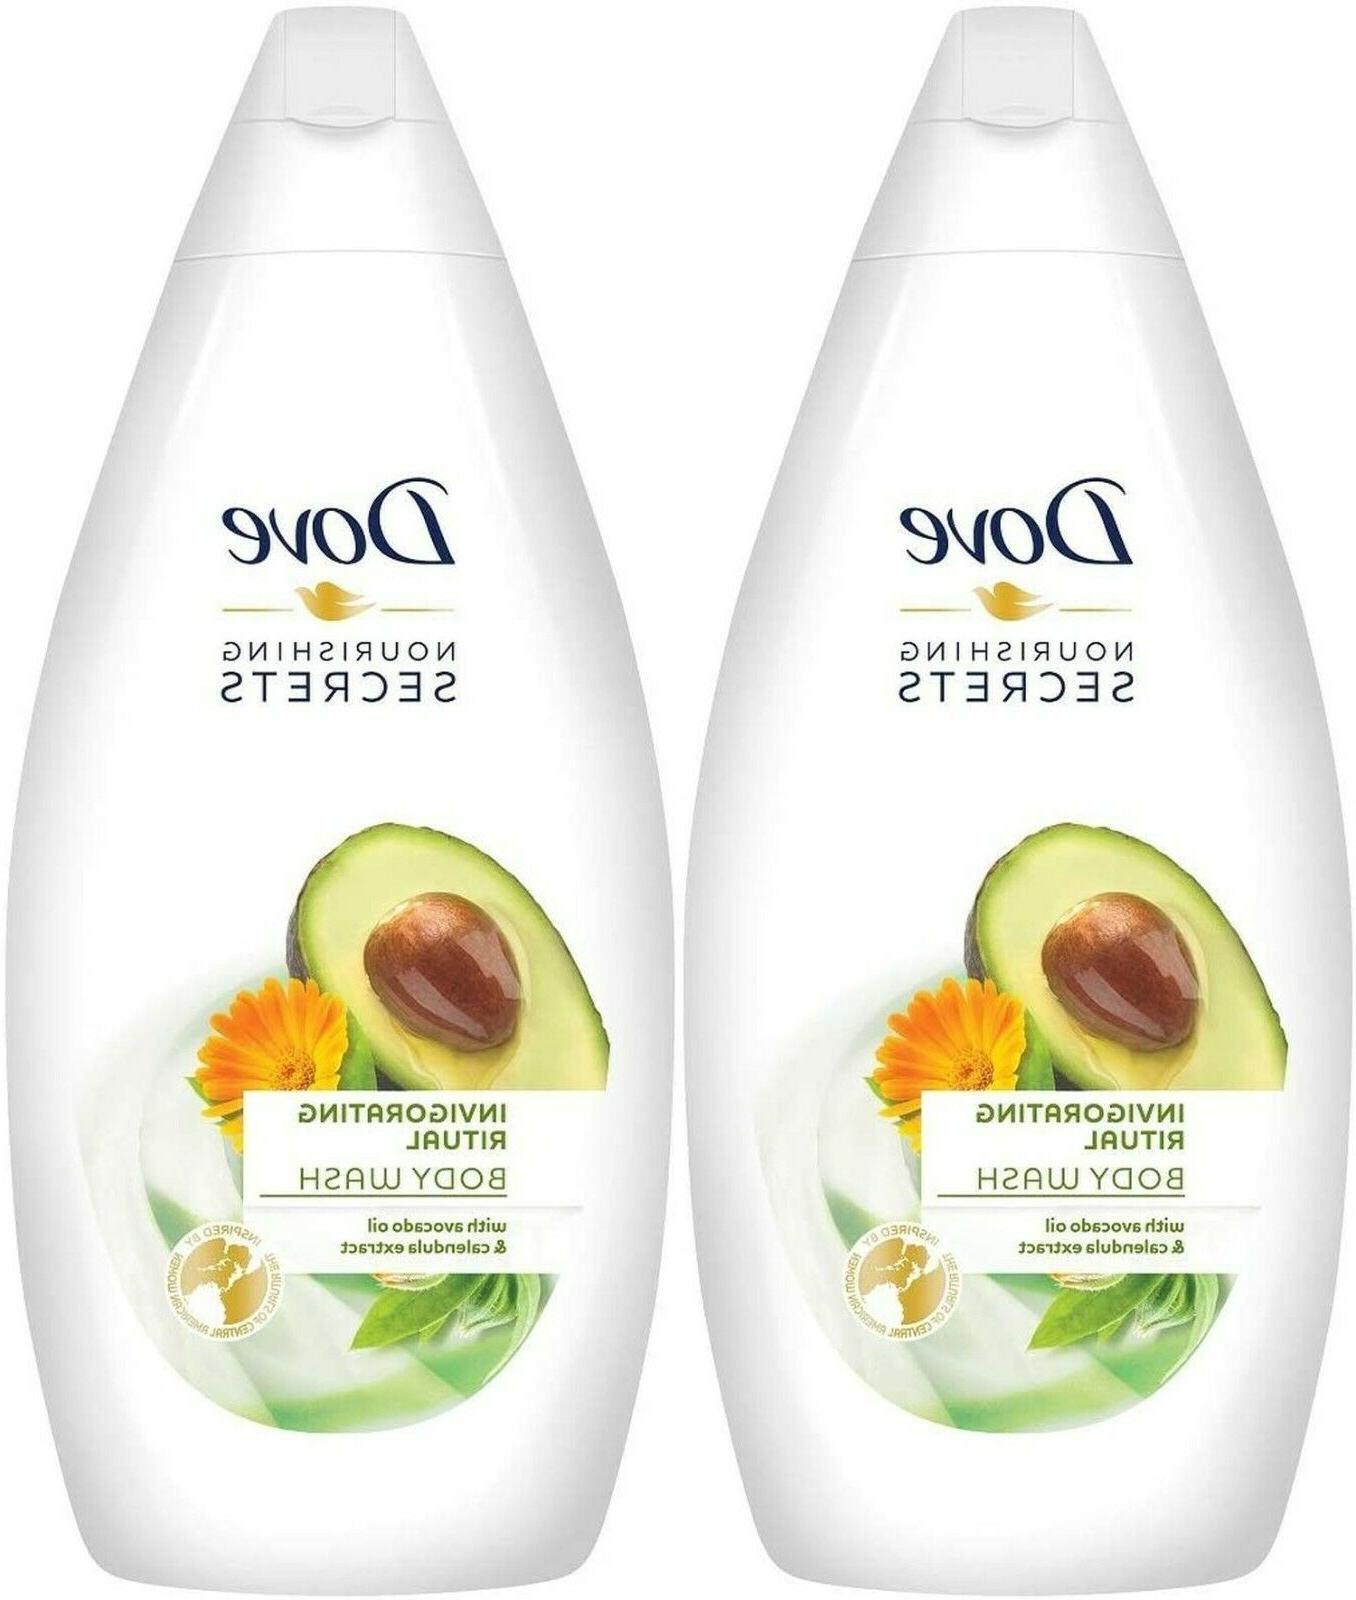 2 Pack Dove Nourishing Secrets Invigorating Ritual Body Wash